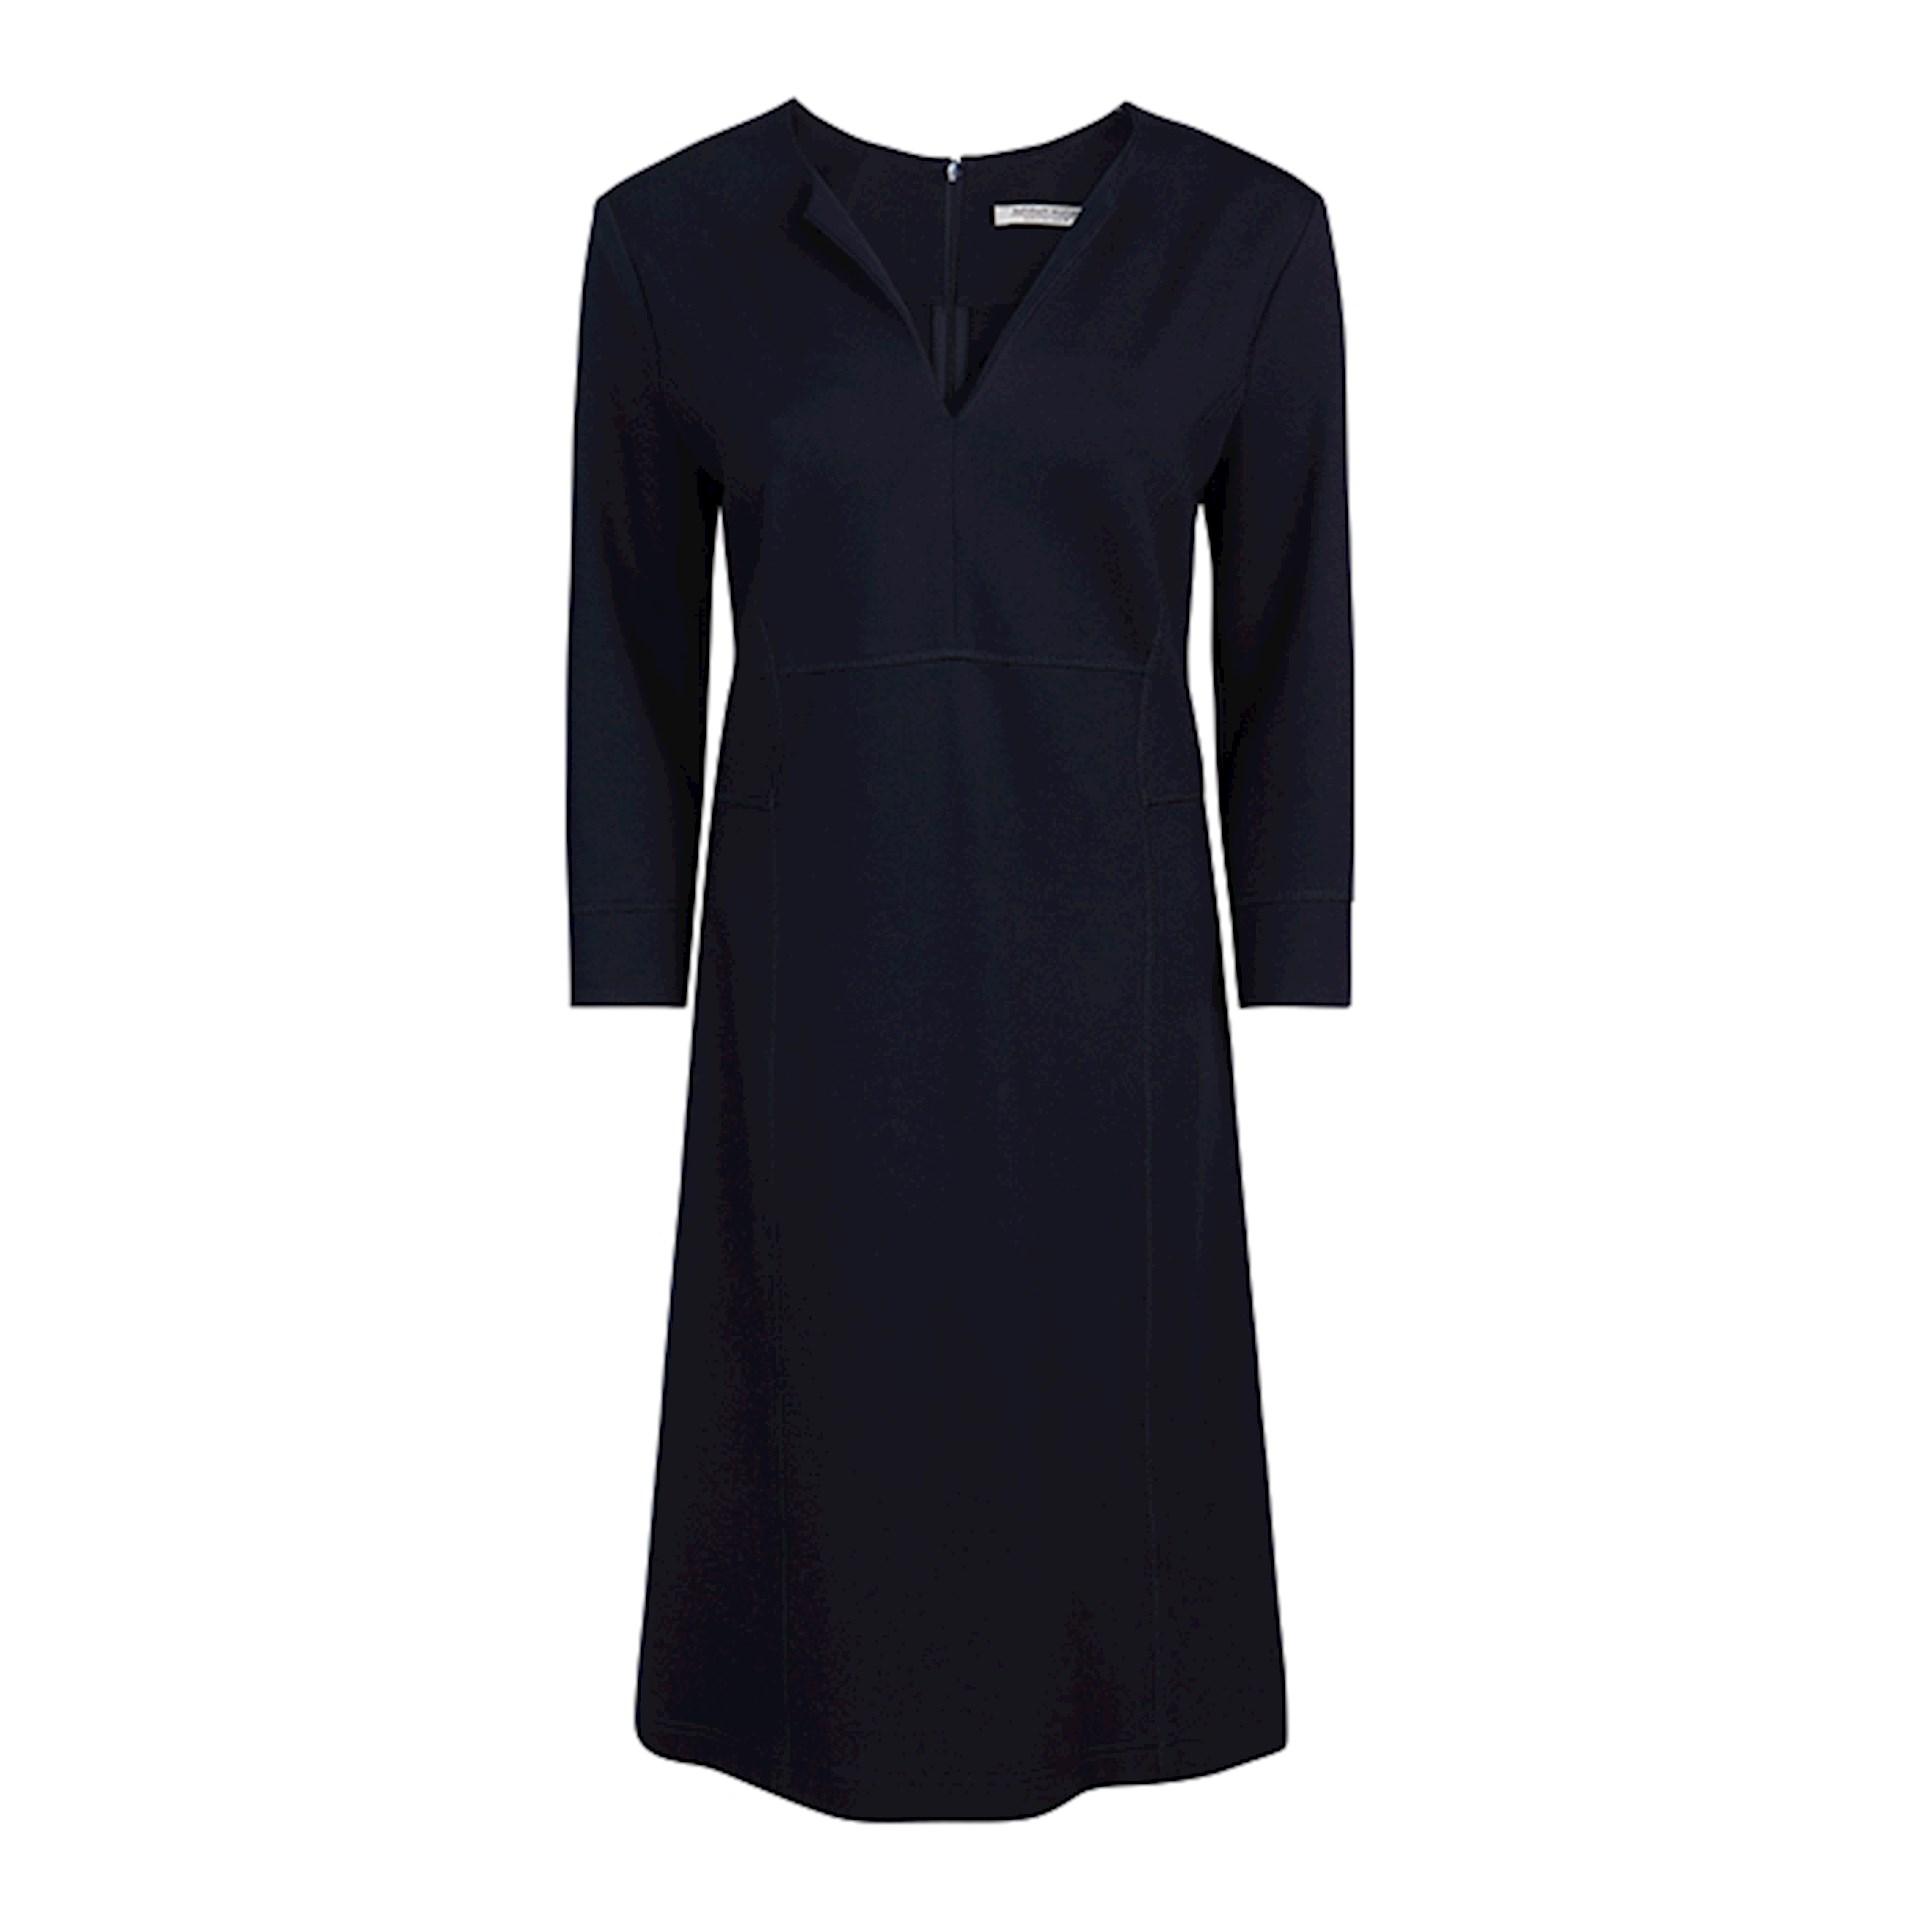 Donkerblauwe dames jurk Summum - 5s1310-496